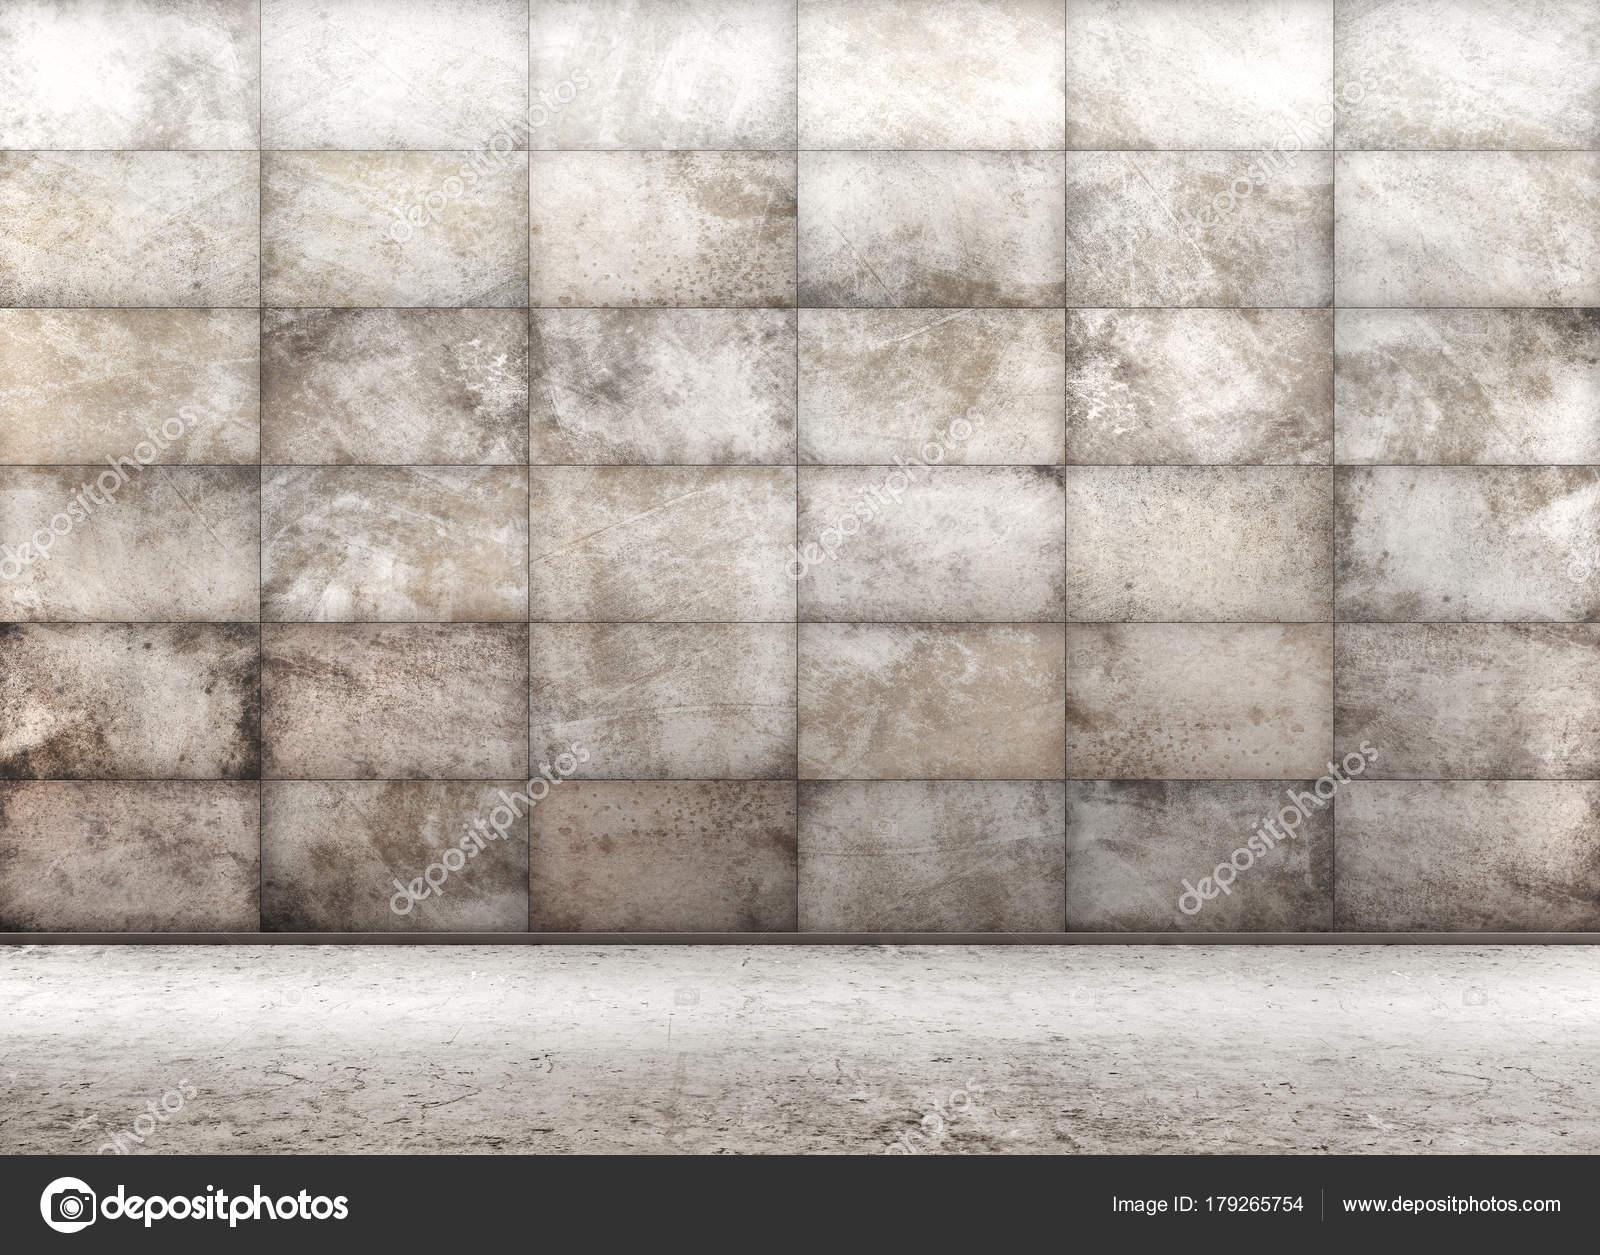 Cemento piastrelle muro interno d rendering in background u foto